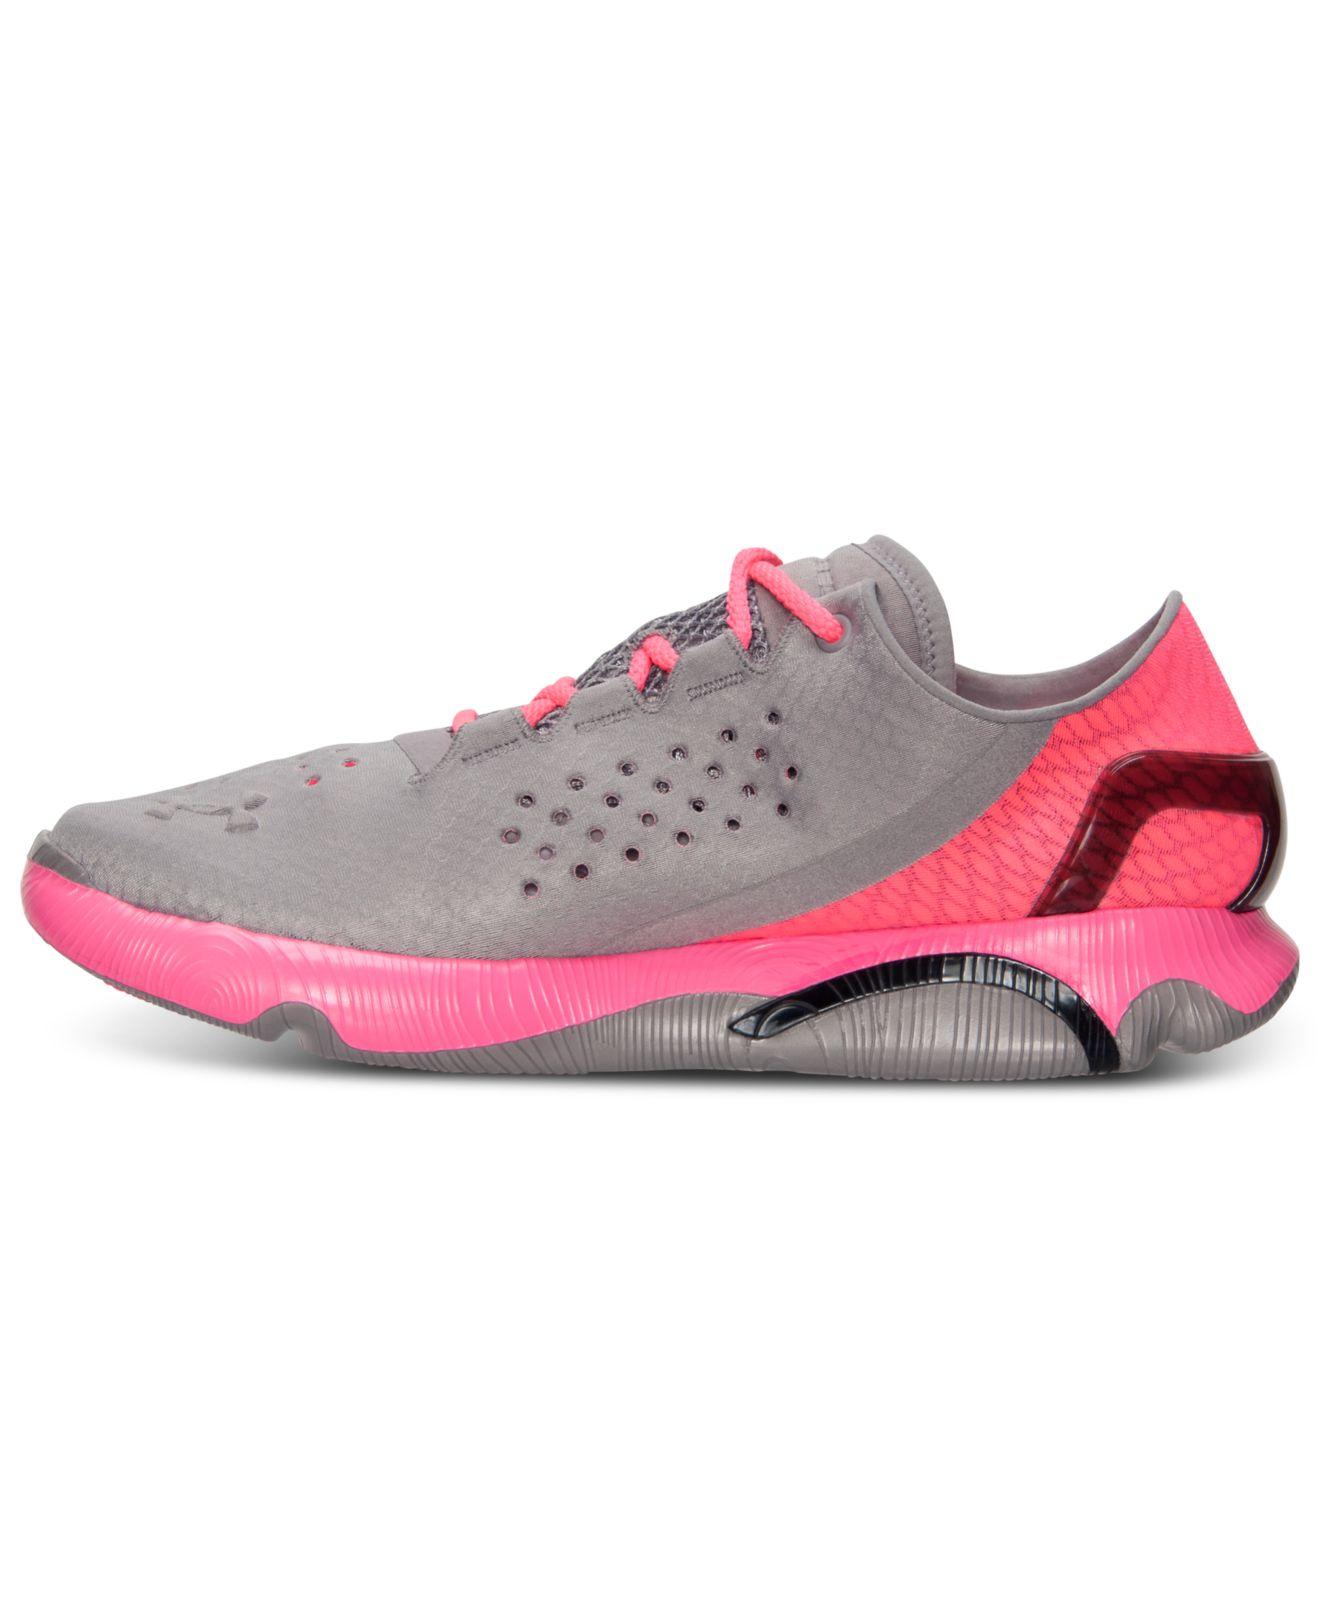 Lyst - Under Armour Women S Speedform Apollo Running Sneakers From ... f076b9c84